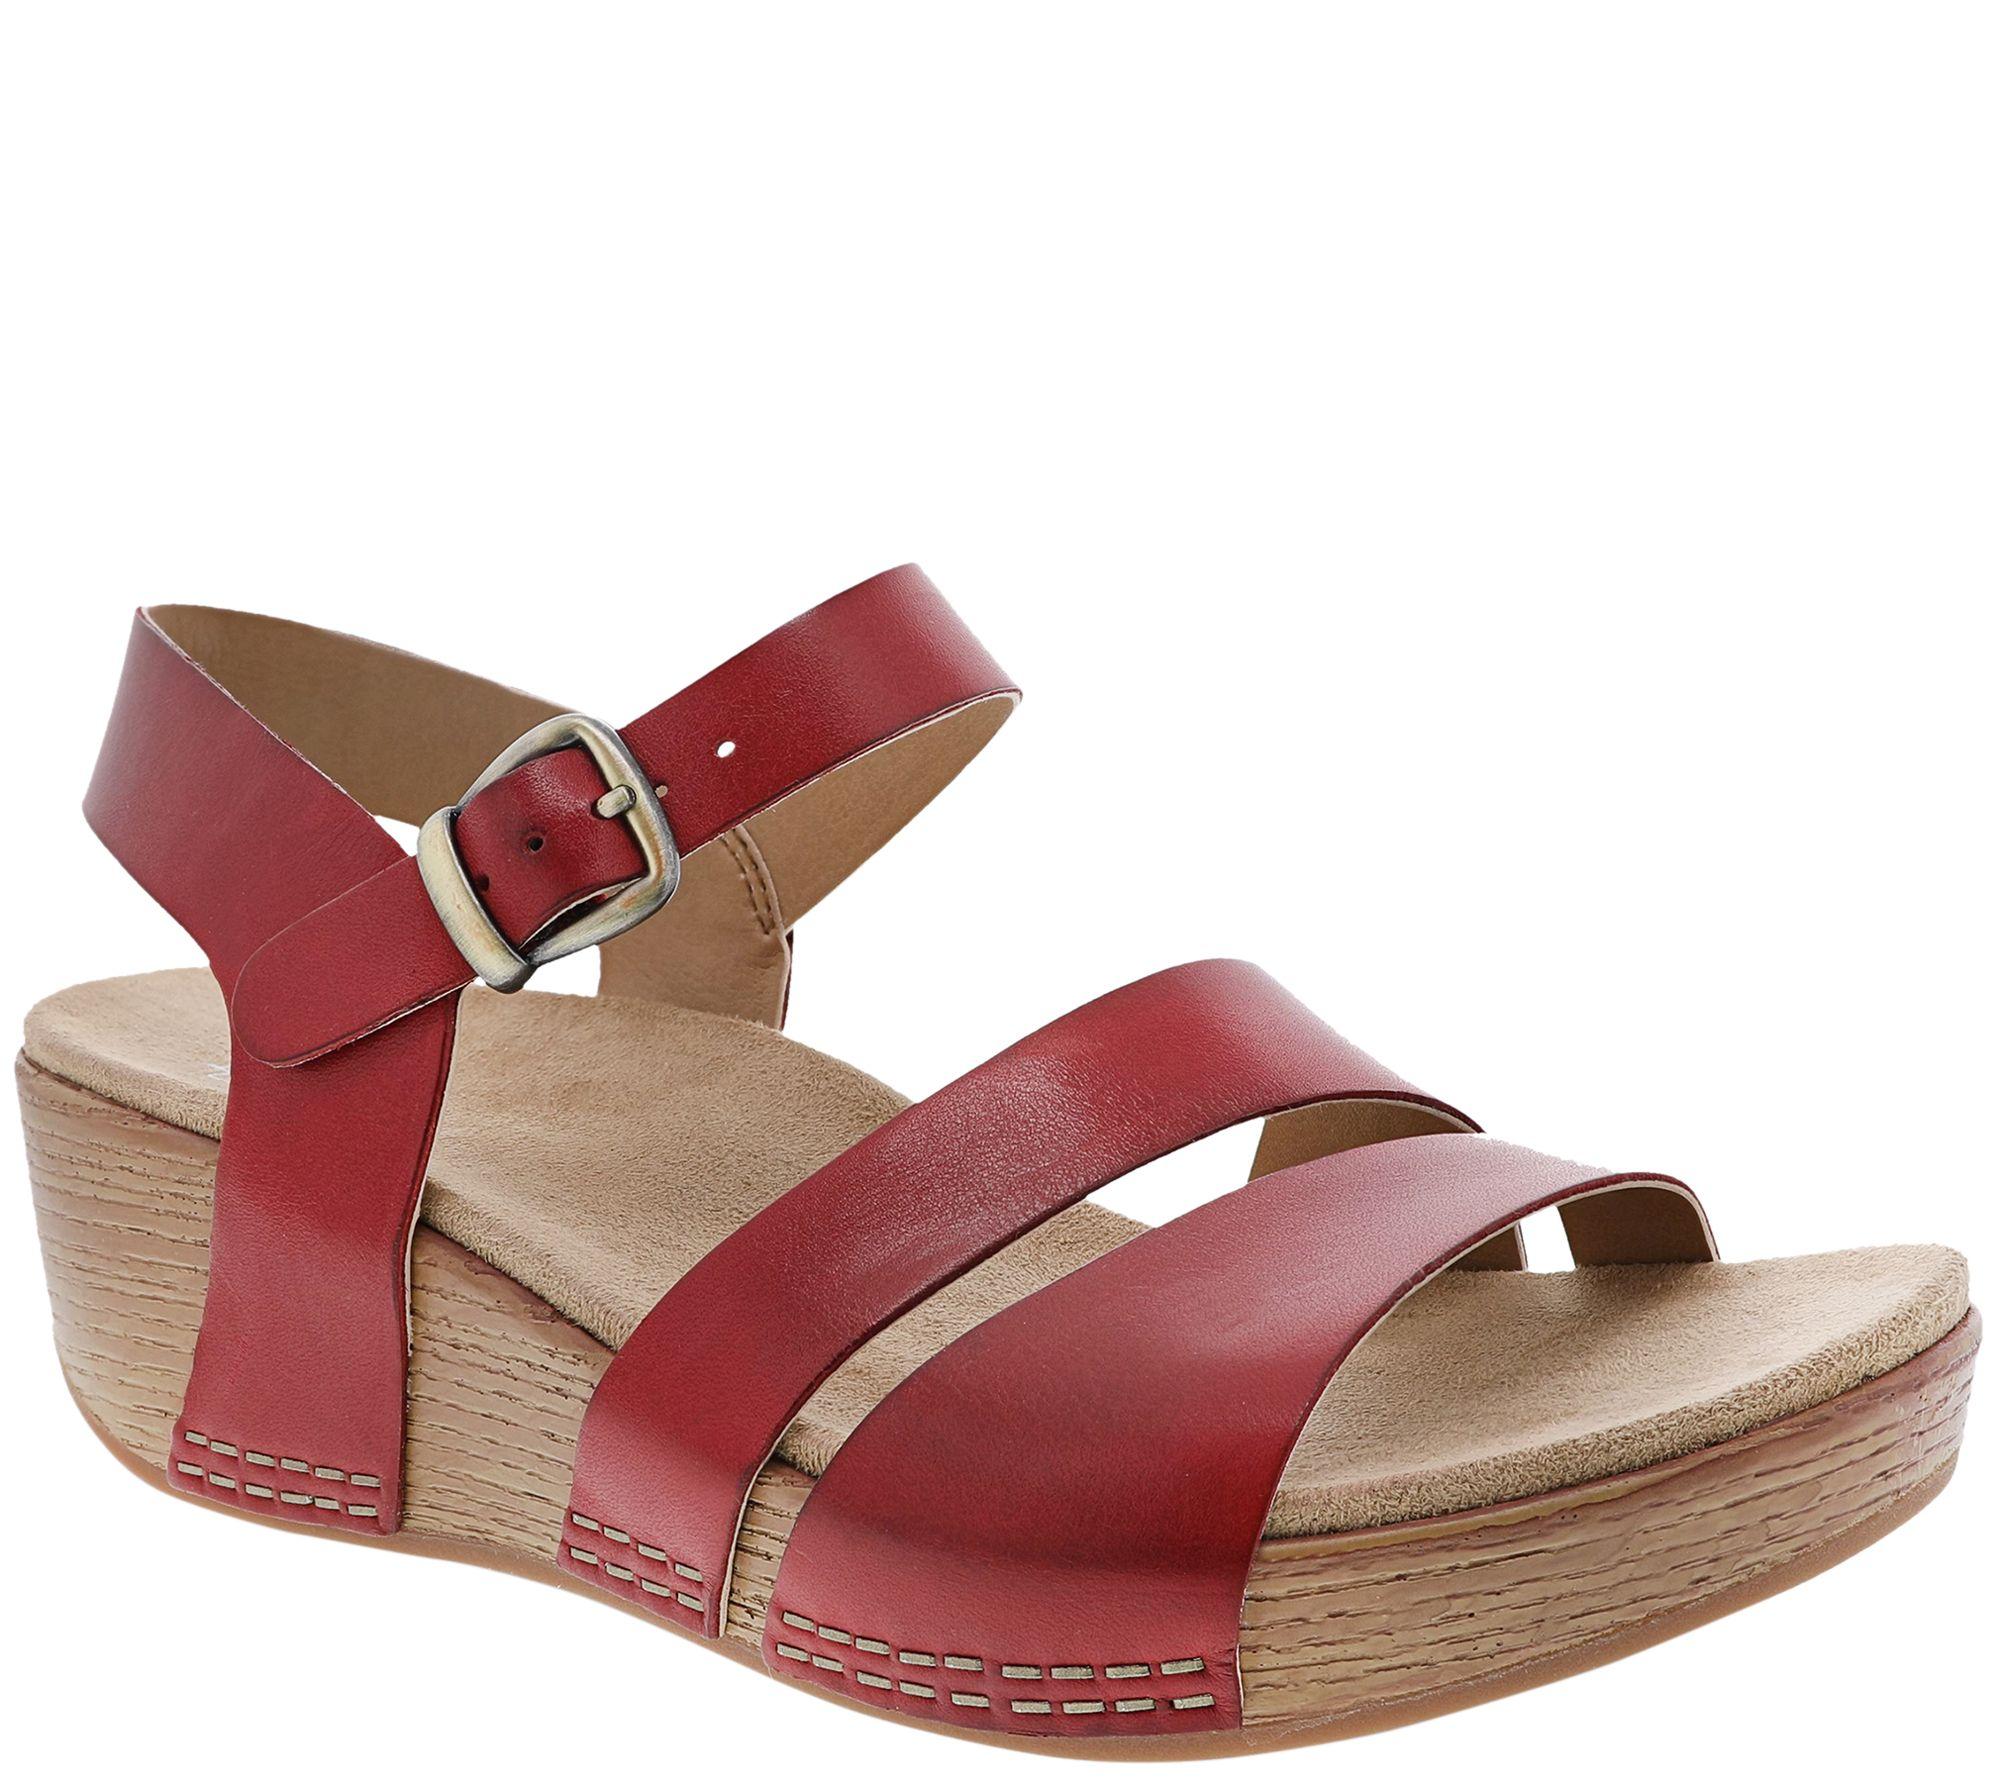 ea758f2cbb2 Dansko Women s Adjustable Ankle Strap Wedge Sandals - Lindsay — QVC.com